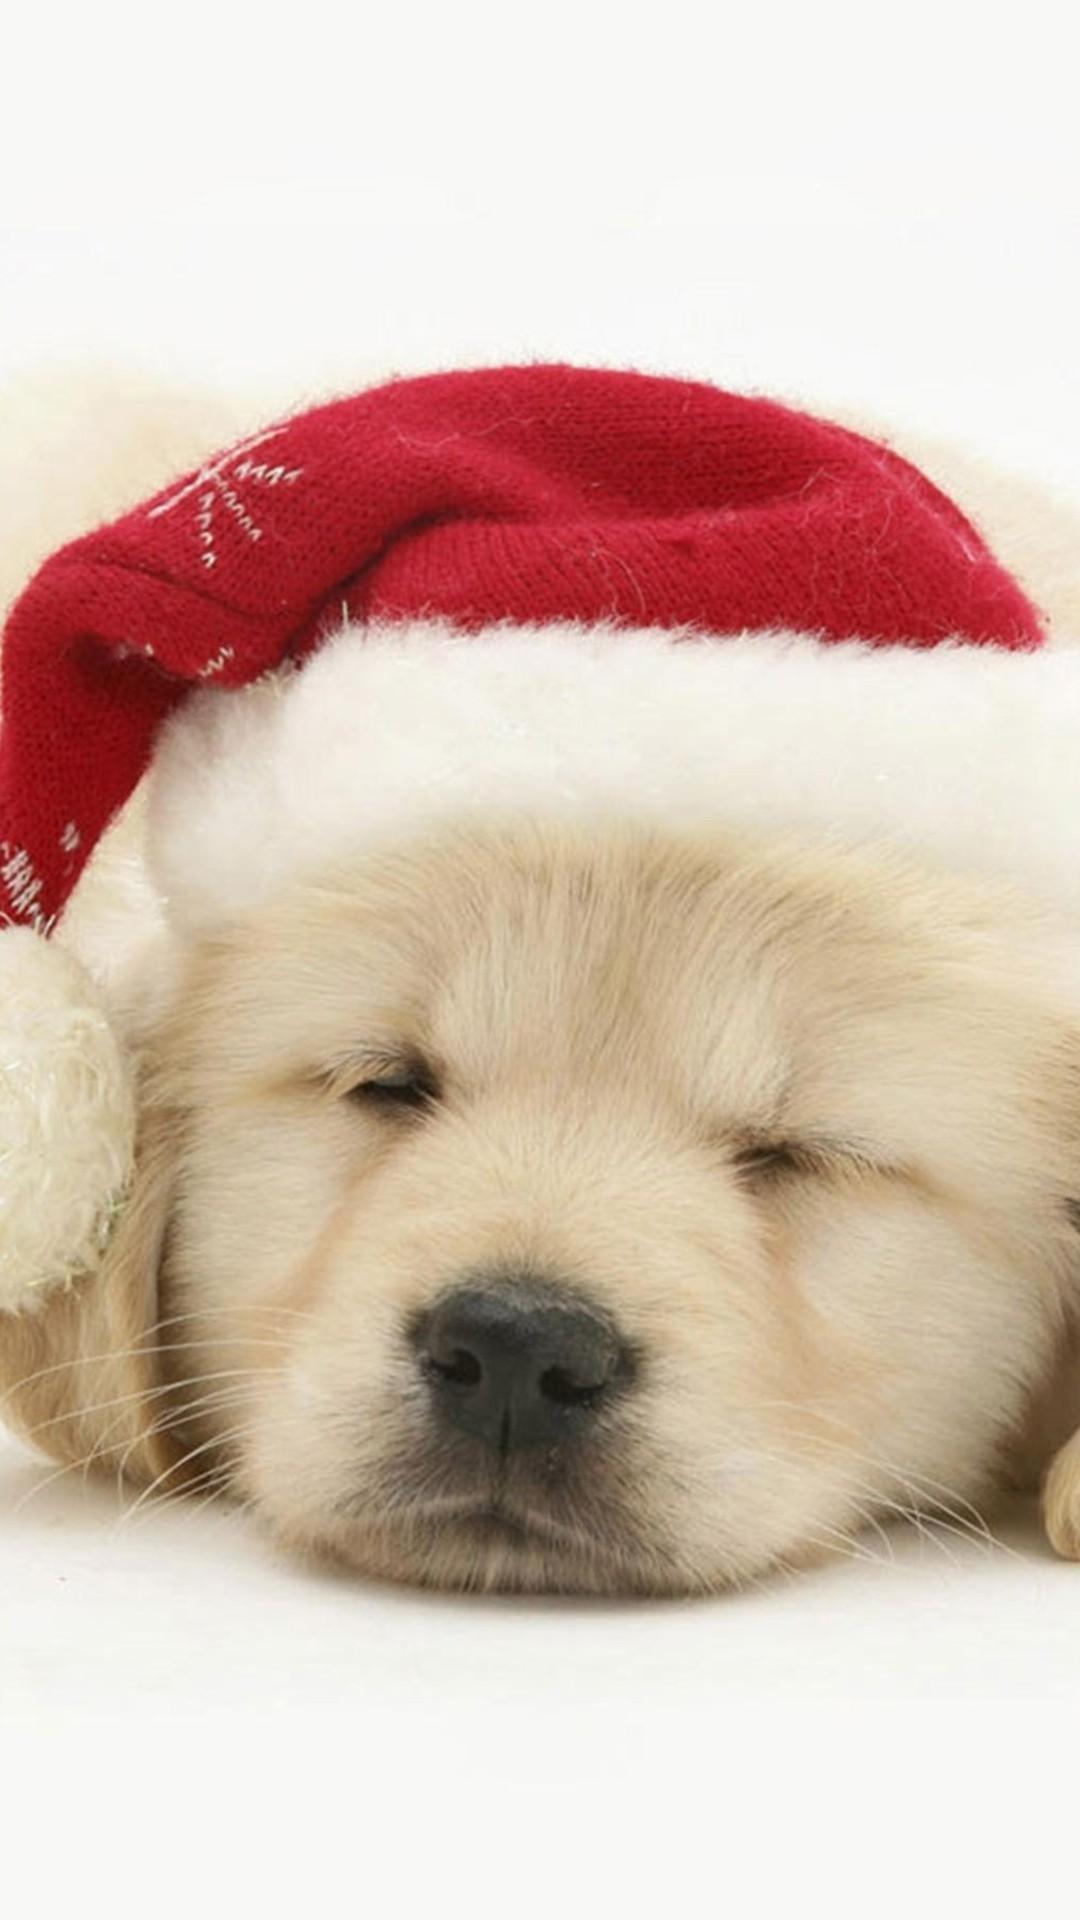 Santa Claus Girl Wallpaper Puppy Christmas Wallpaper 183 ① Wallpapertag